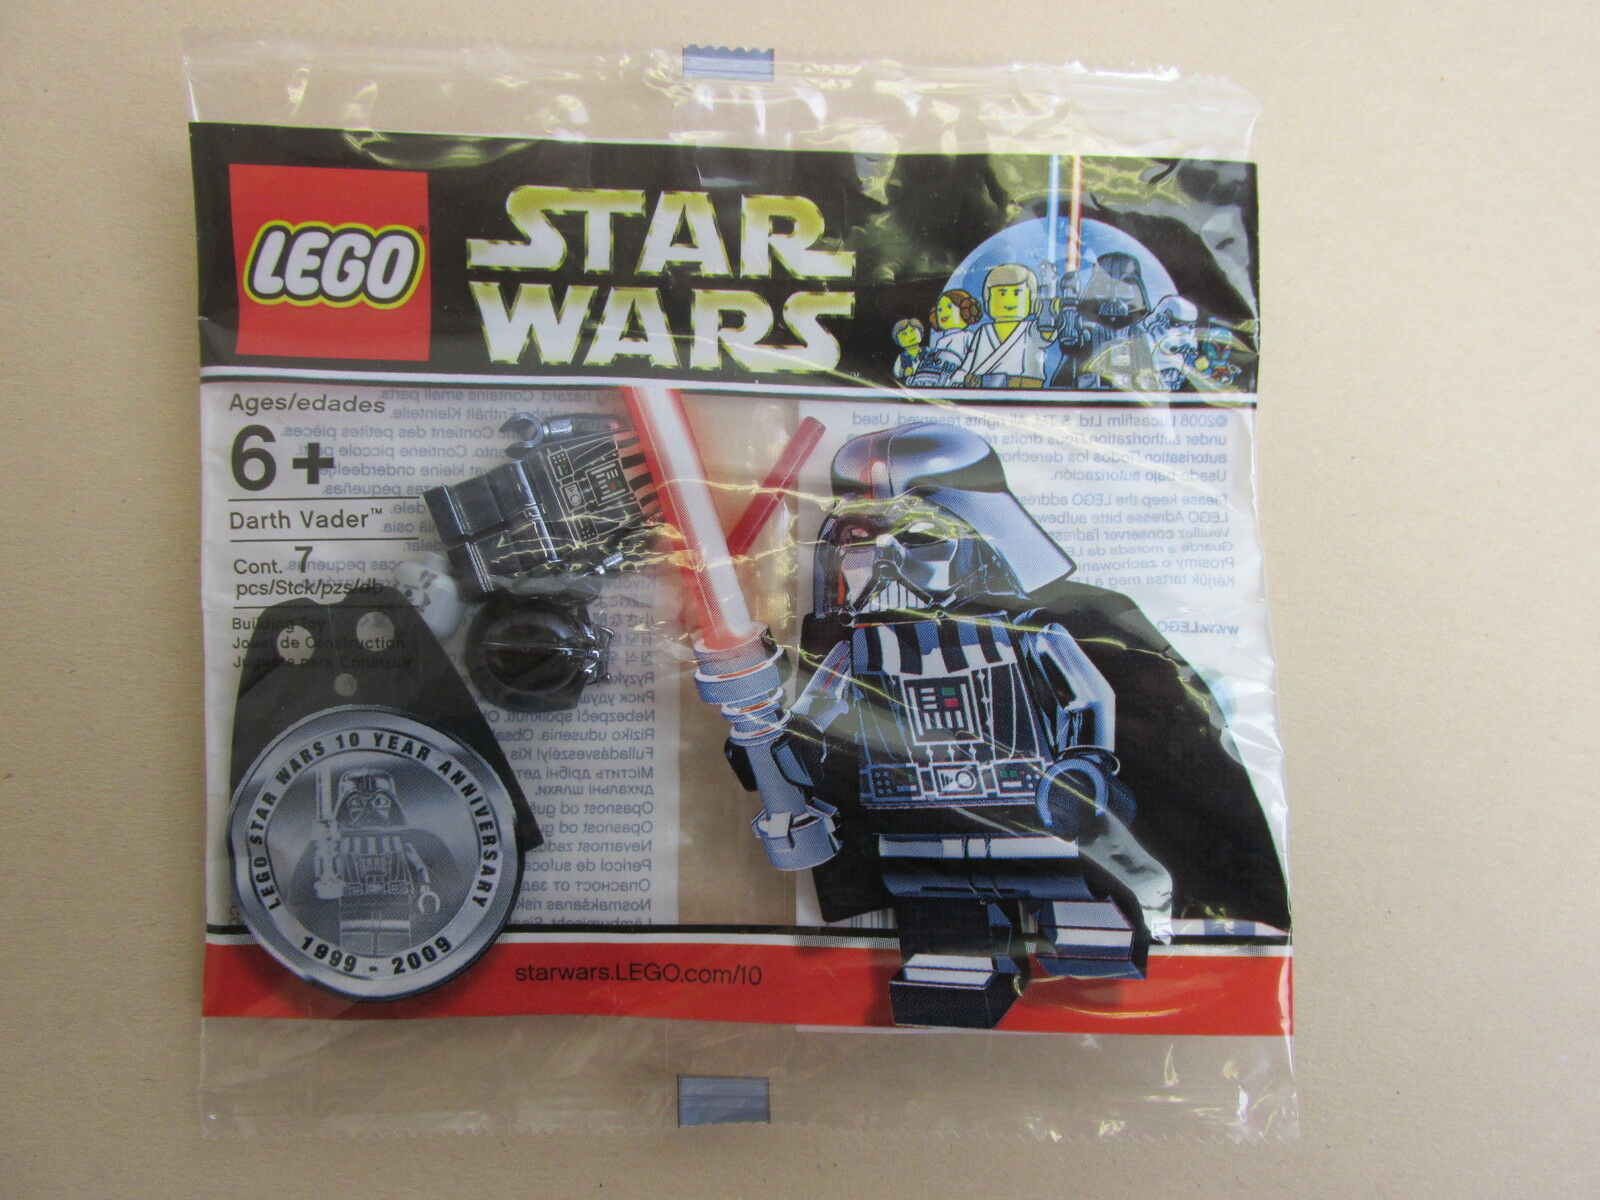 VERY RARE lego star wars CHROME DARTH VADER minifigure polybag NEW SEALED promo